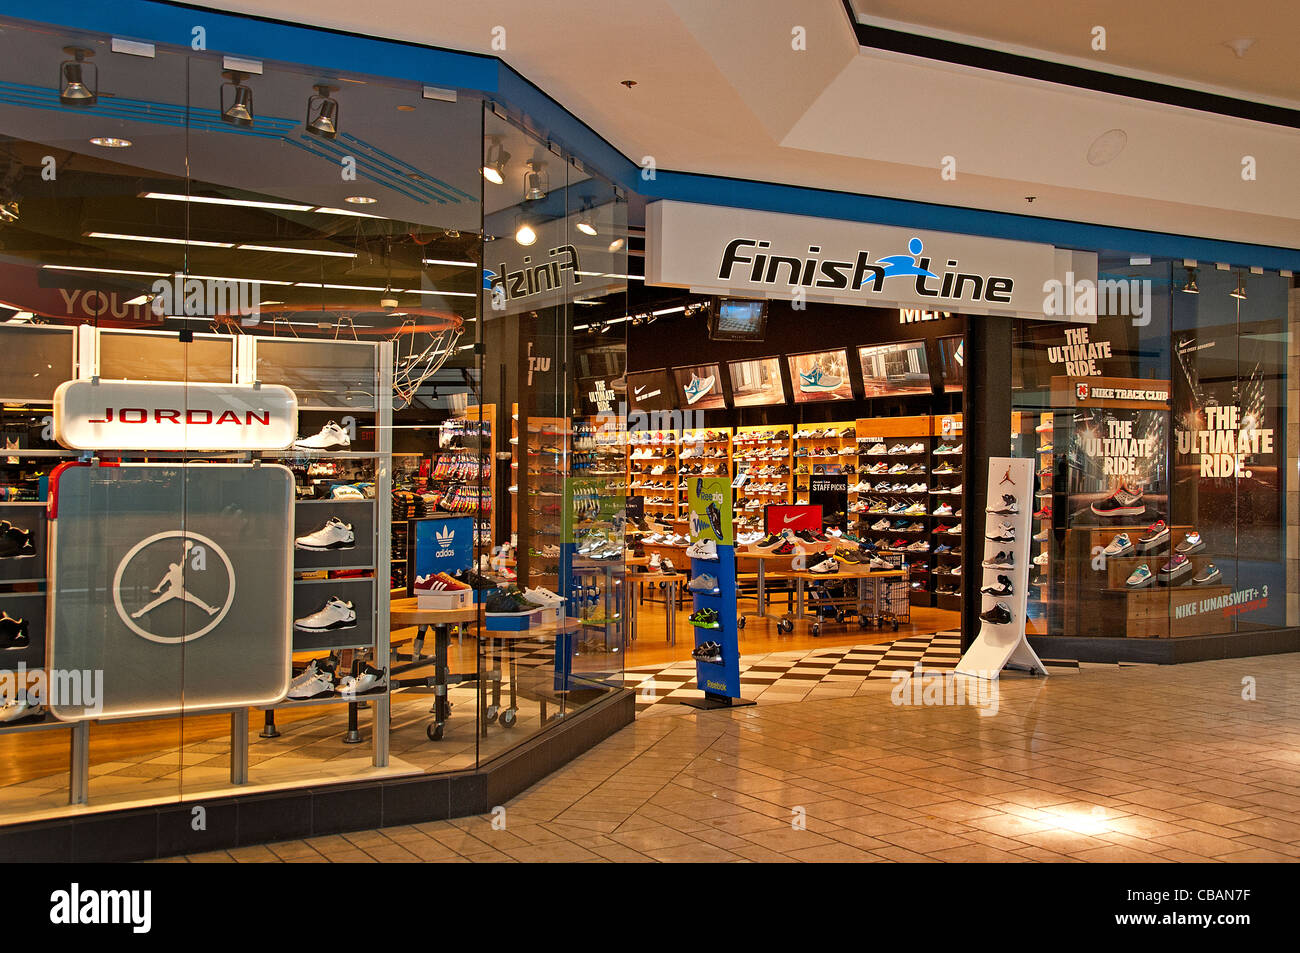 Finish line Jordan The Grove Farmers Market retail entertainment shopping mall  Los Angeles California United States - Stock Image